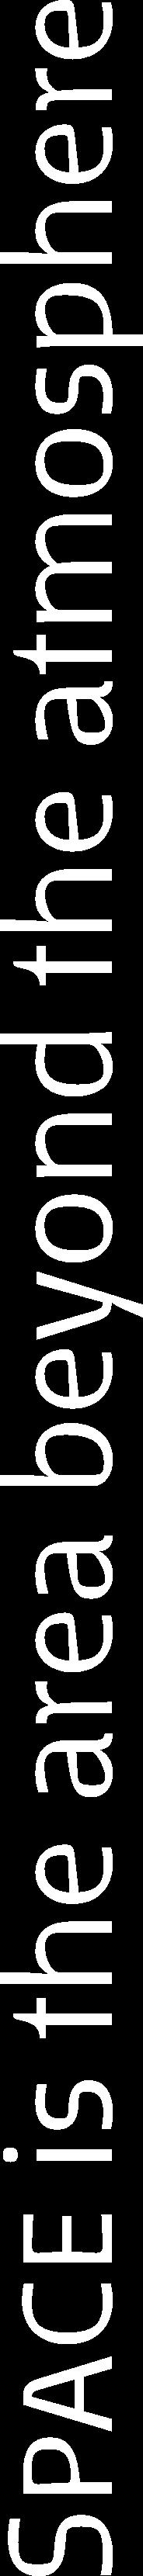 Image-Line-1